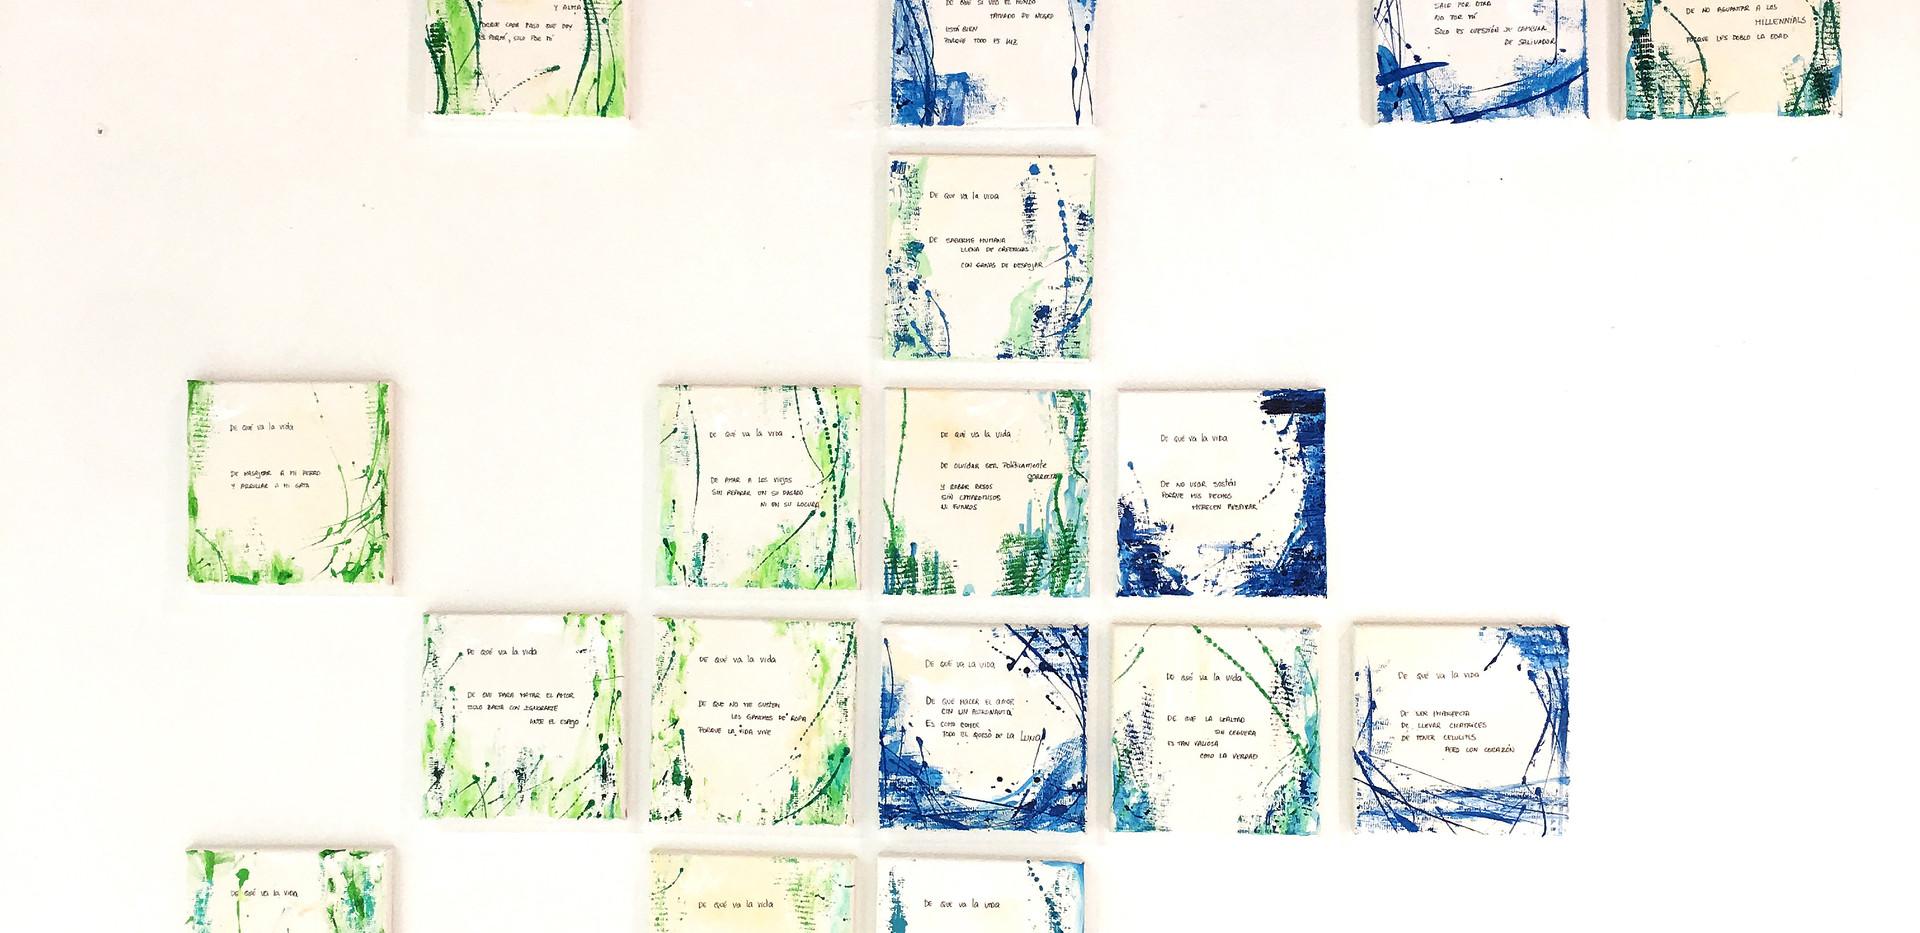 Karina Matheus - De qué va la vida - Poem Installation